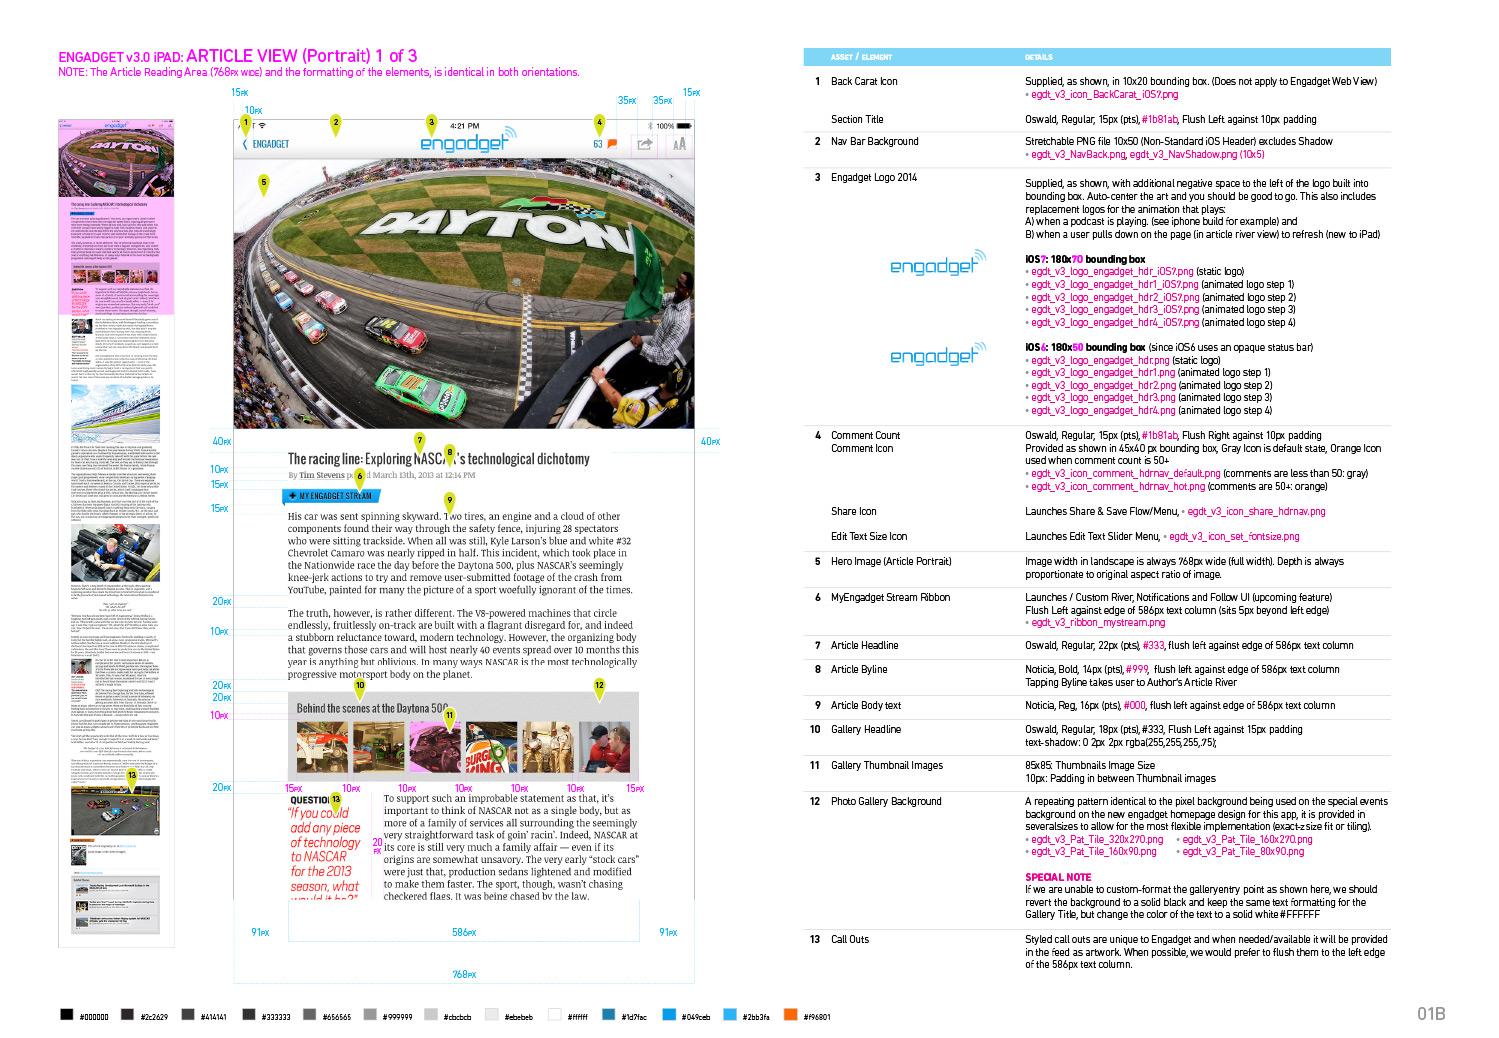 Engadget_iPad_DesignSpecs_Sample-1.jpg